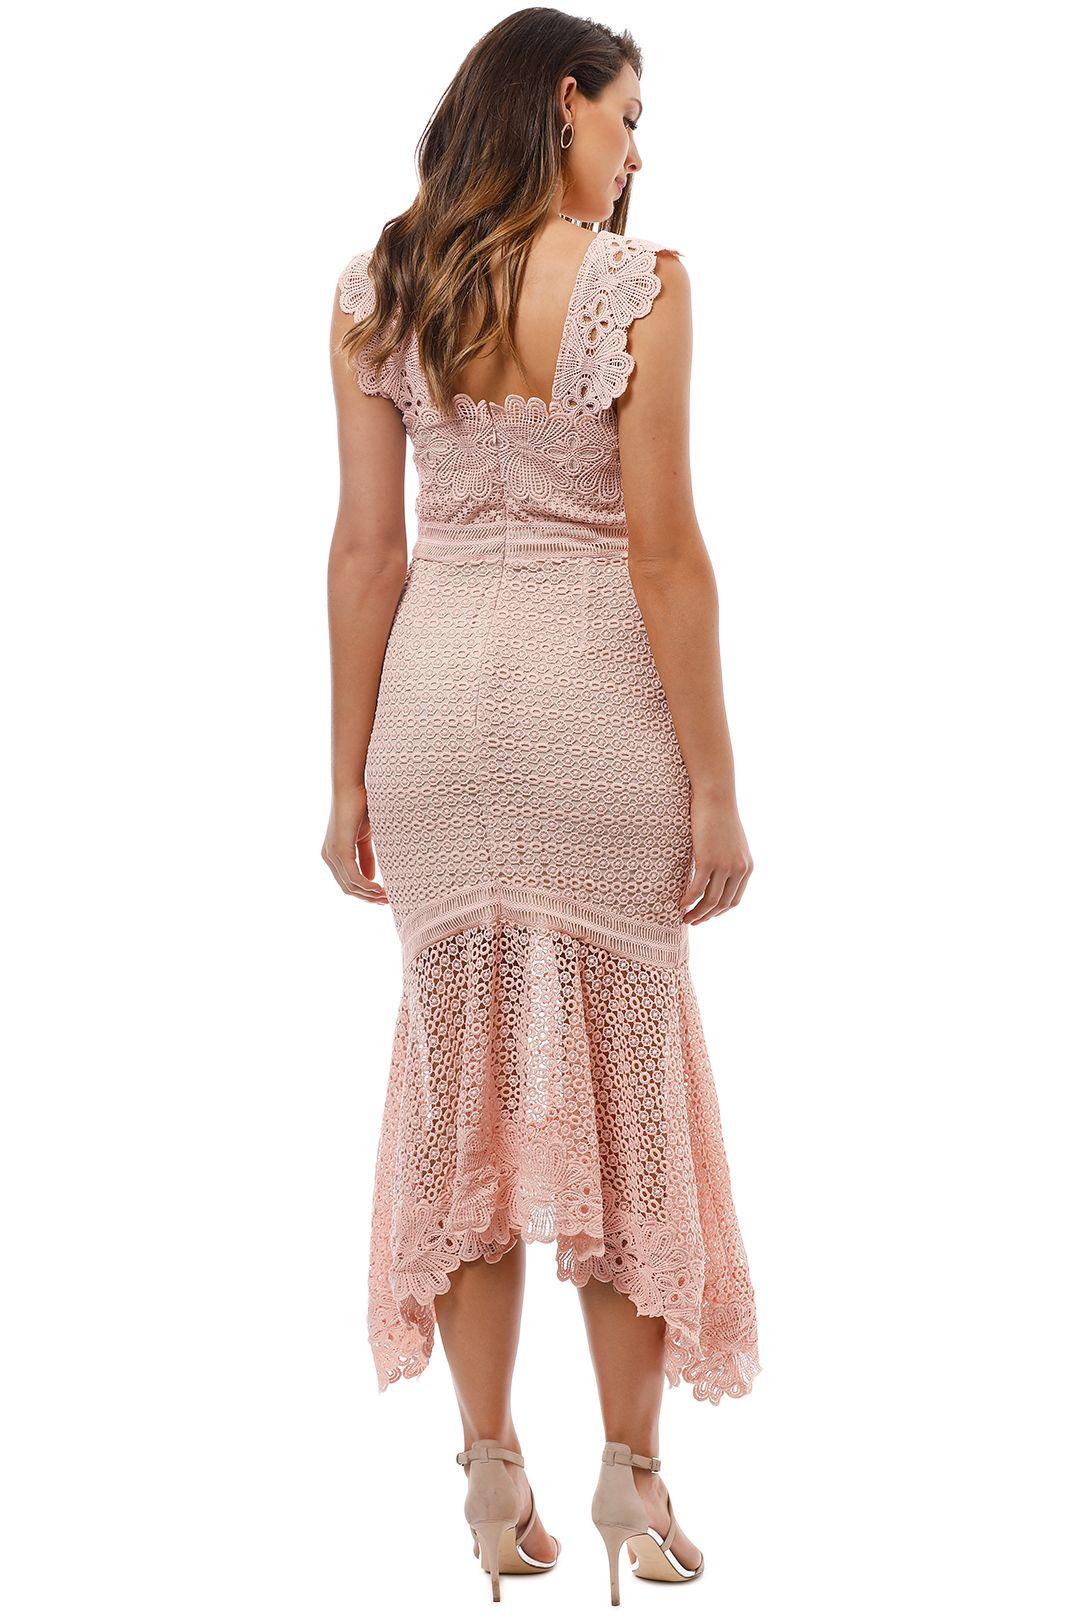 Grace and Hart - Paradiso Midi Dress - Rose - Back